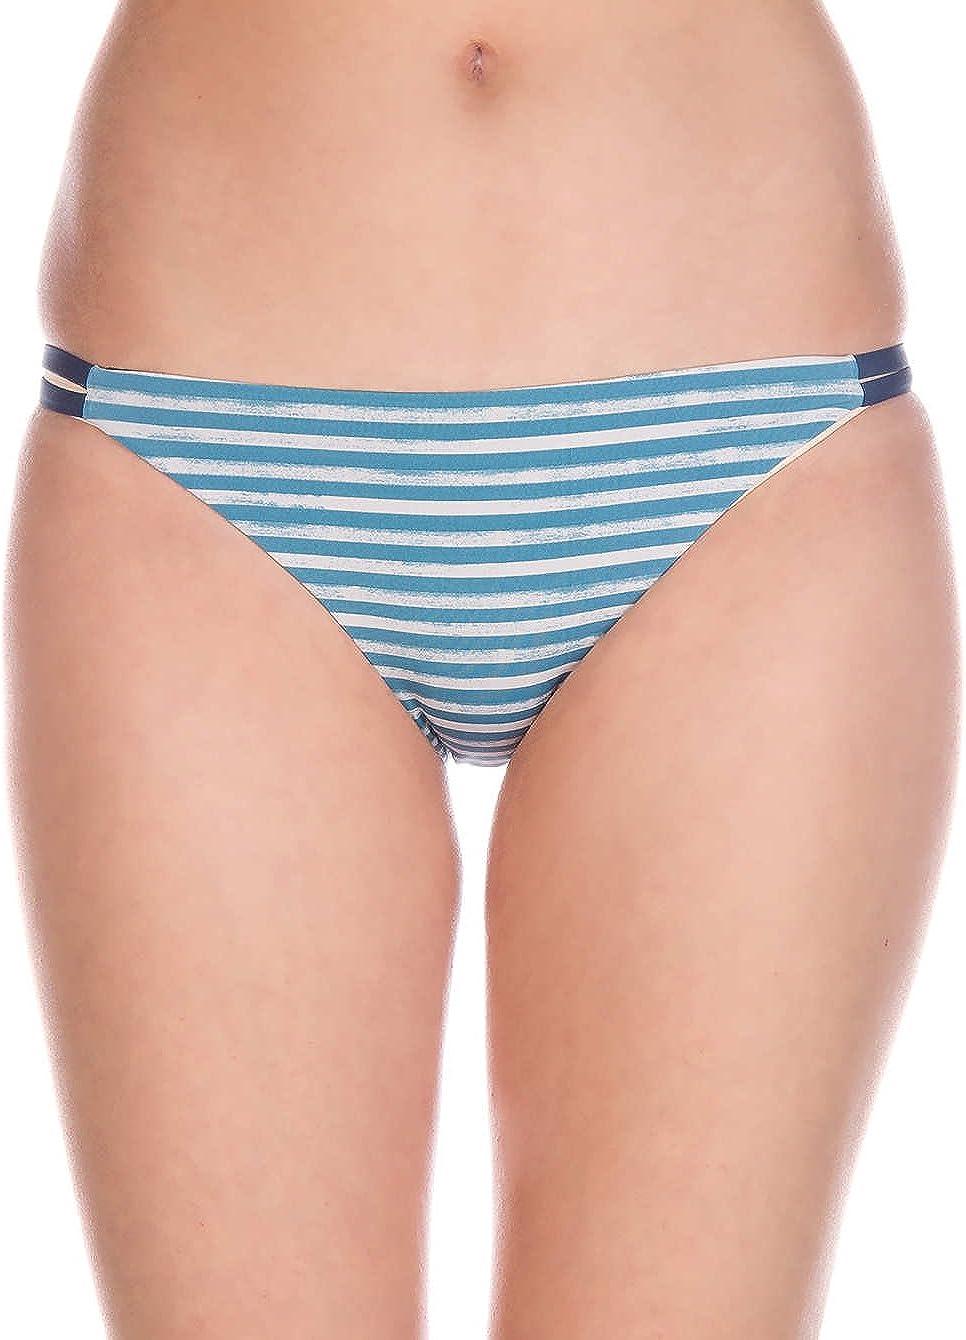 Hurley womens Quick Dry Compression Printed Bikini Surf Bottom